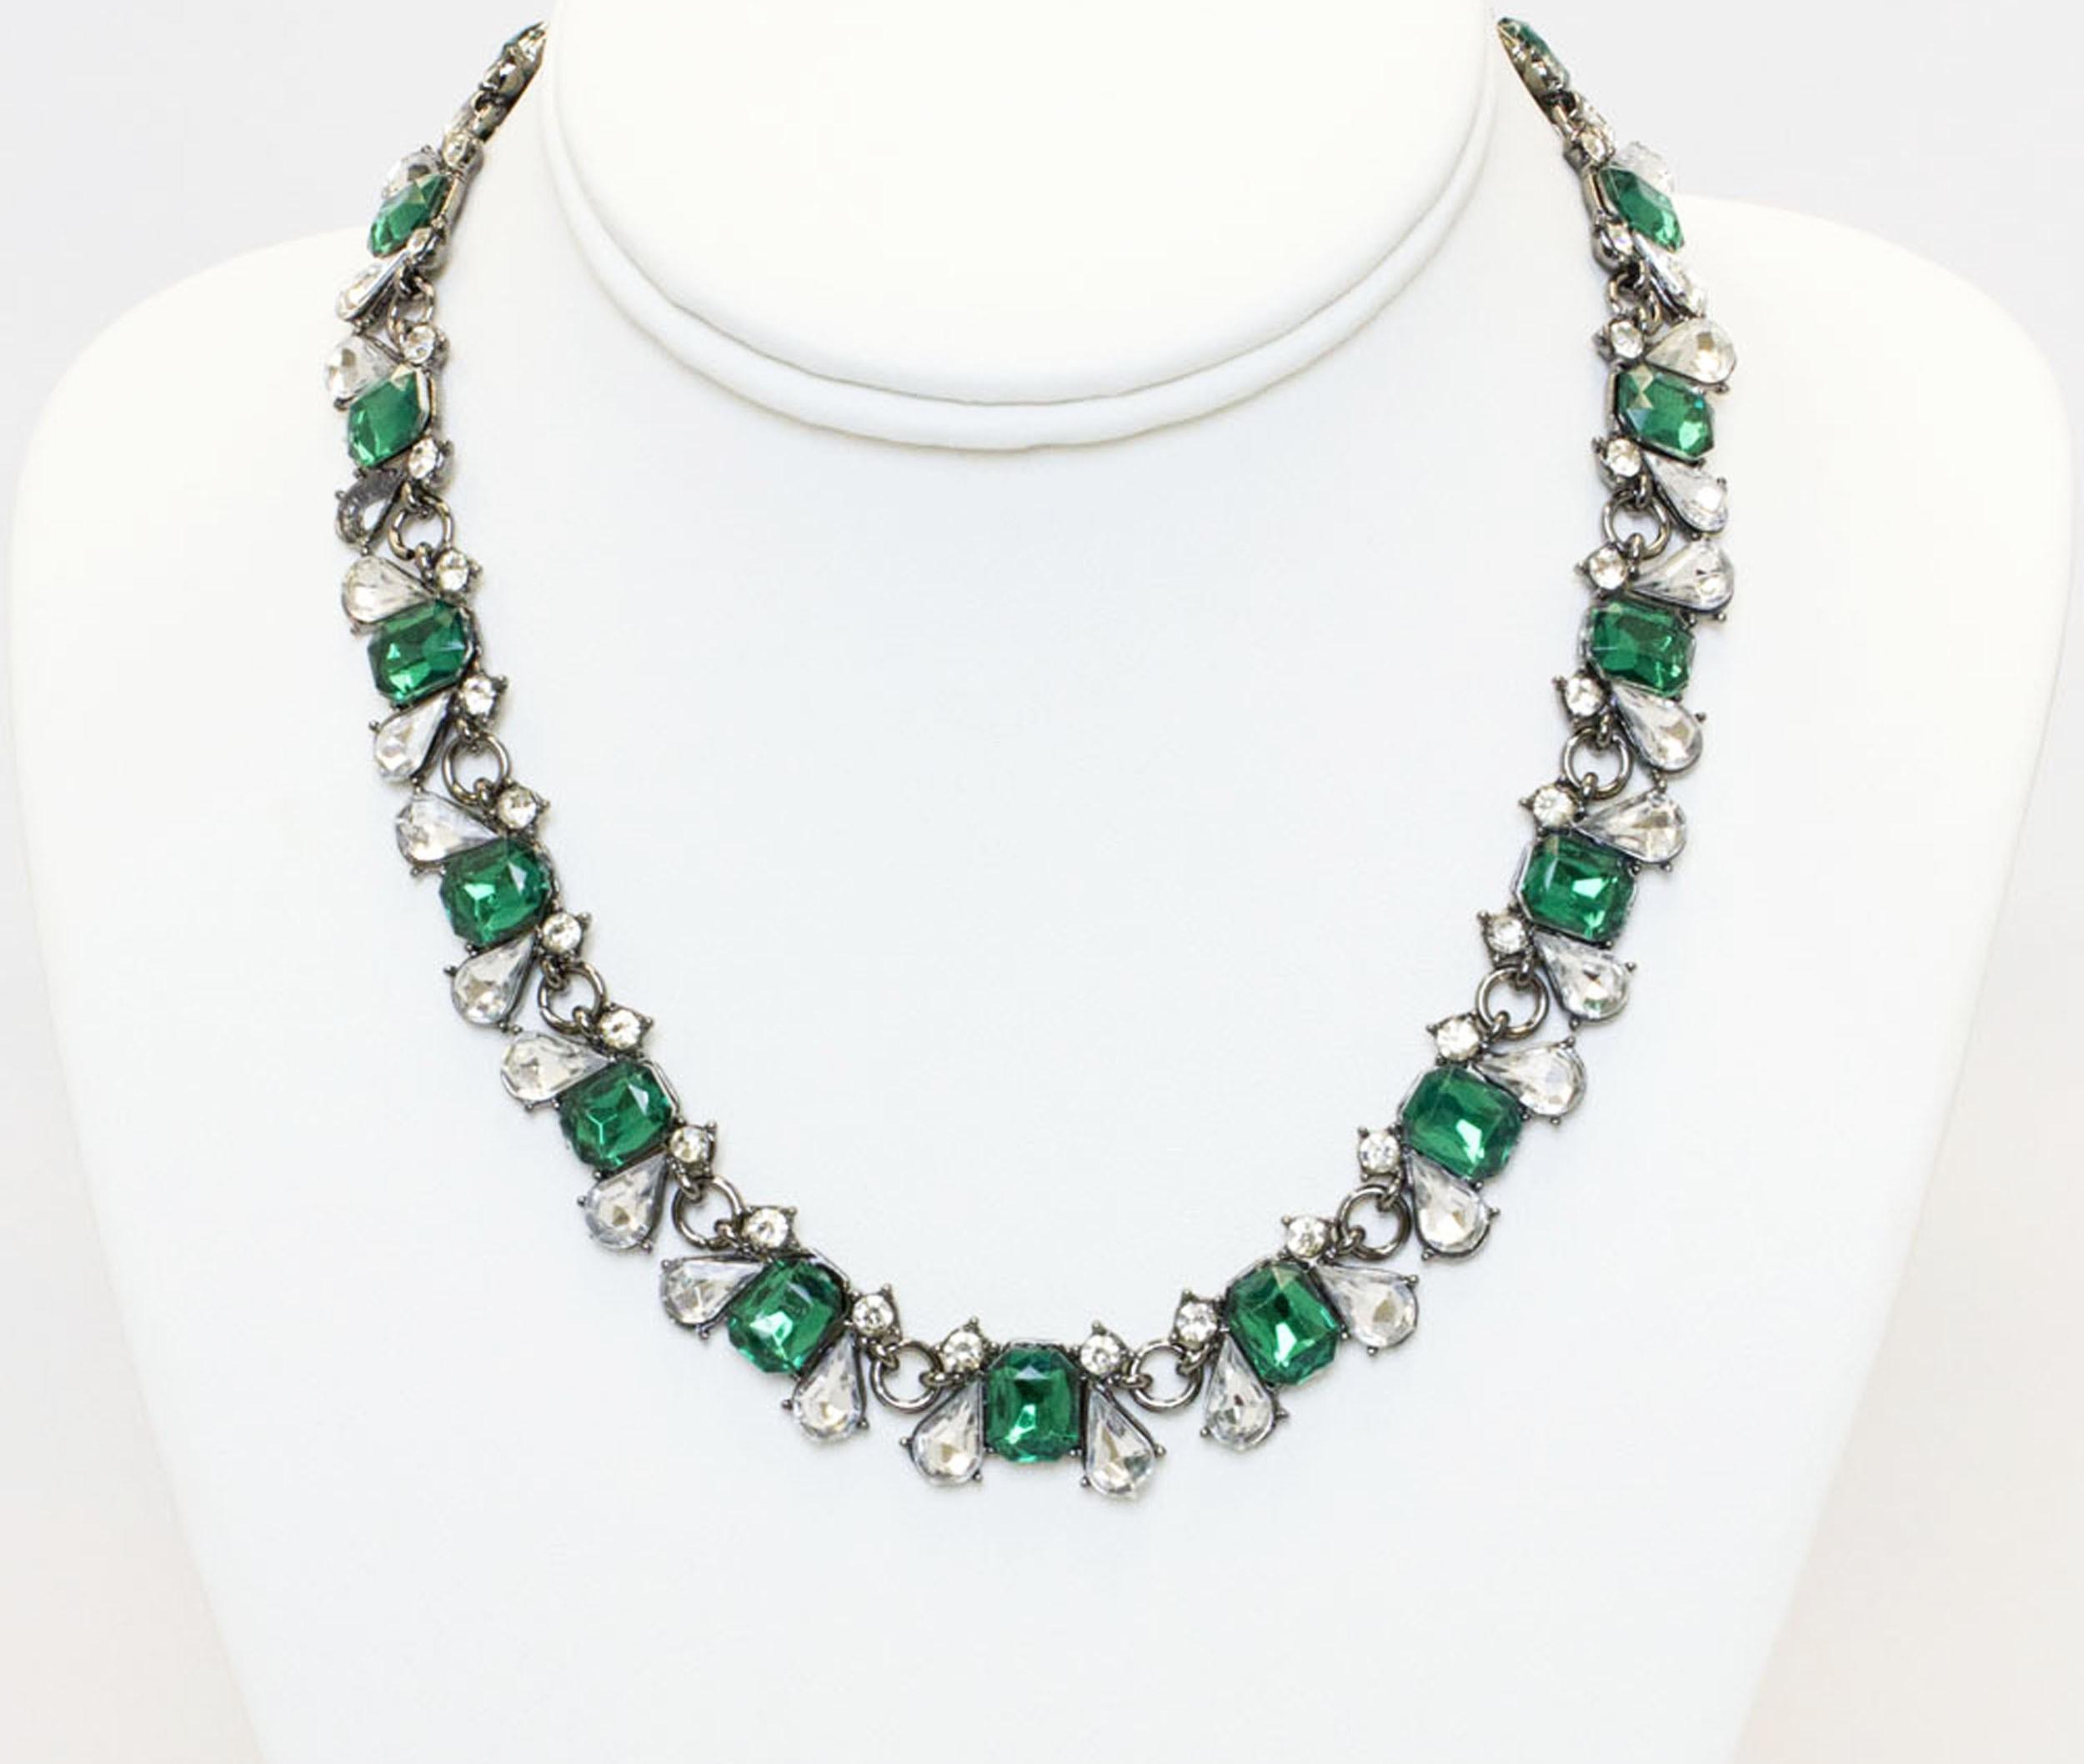 Multicolored Stones Collar Necklace